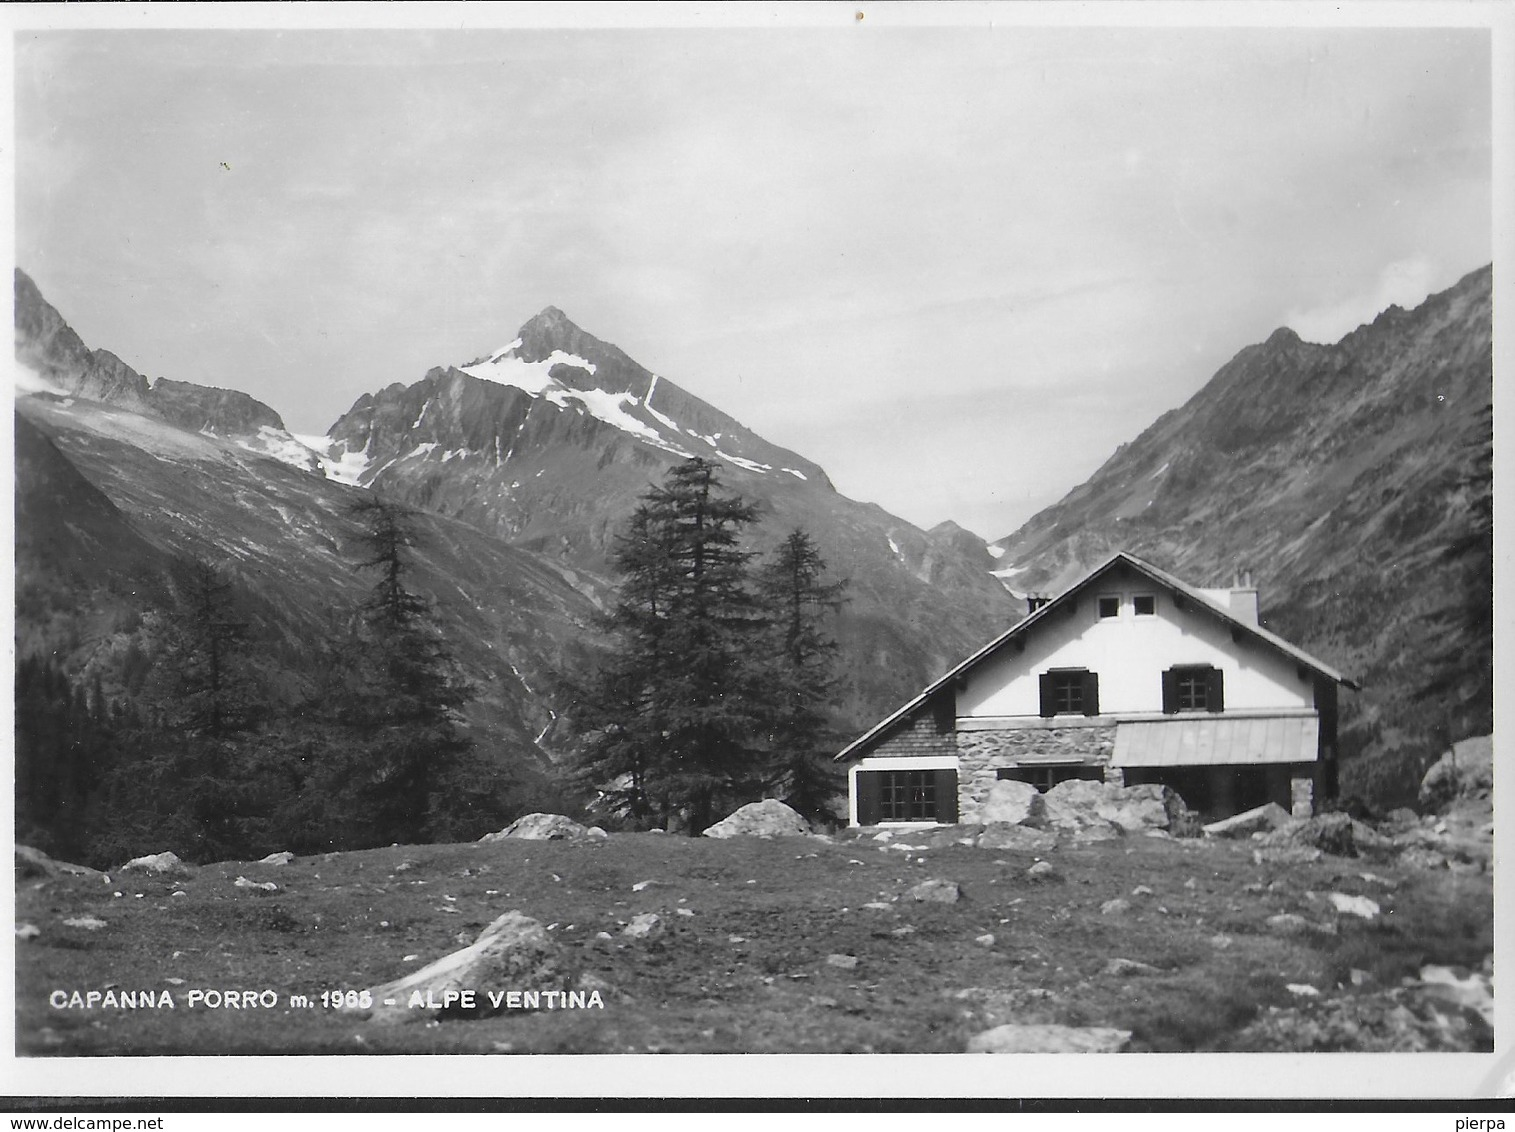 ALPE VENTINA - CAPANNA PORRO - VALMALENCO - EDIZ. DONADELLI - NUOVA - Alpinisme